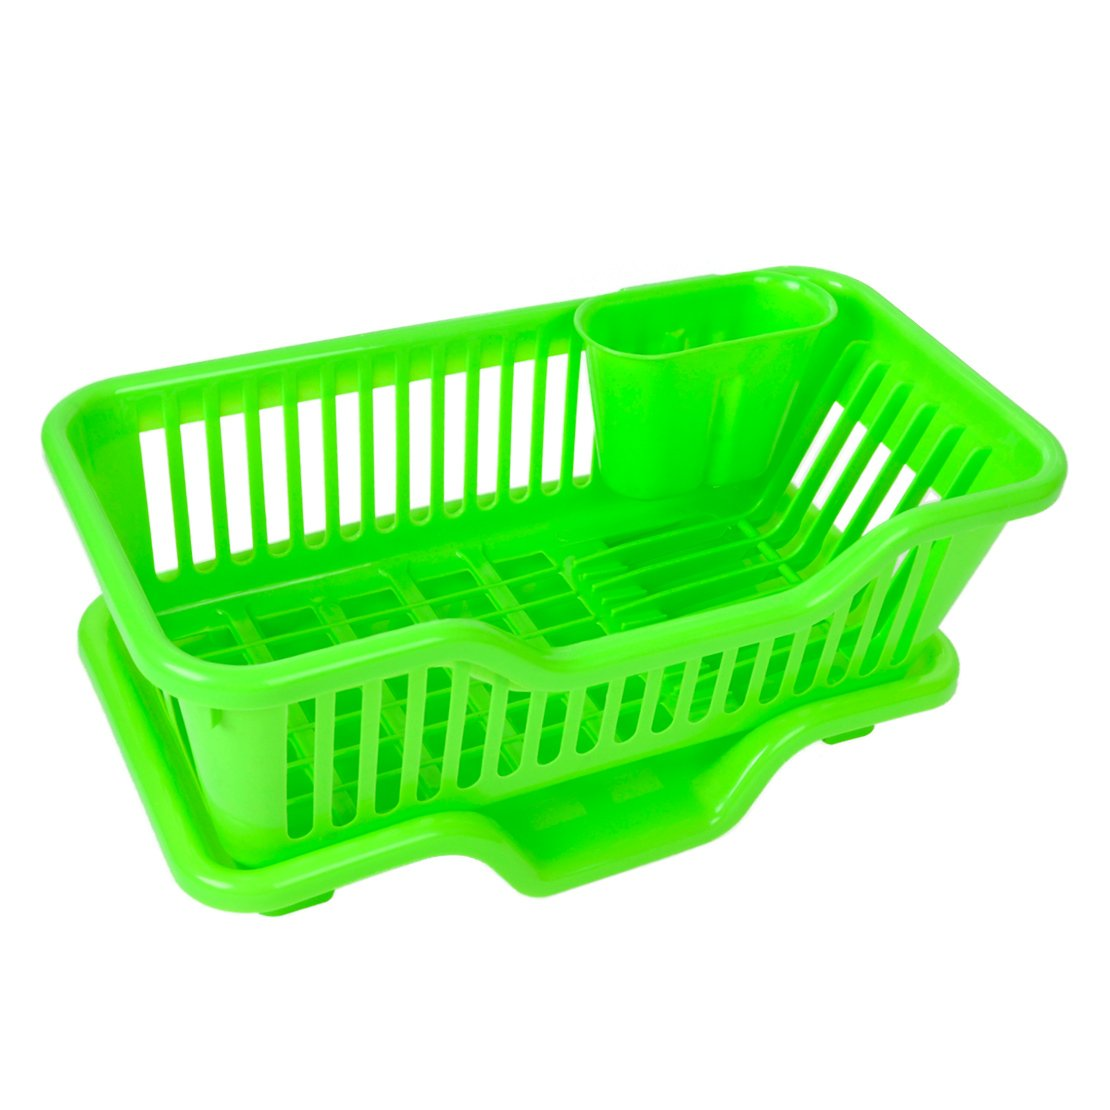 MAZIMARK-Kitchen Sink Dish Plate Drainer Drying Rack Washing Organizer Tray Holder Basket (green) by MAZIMARK